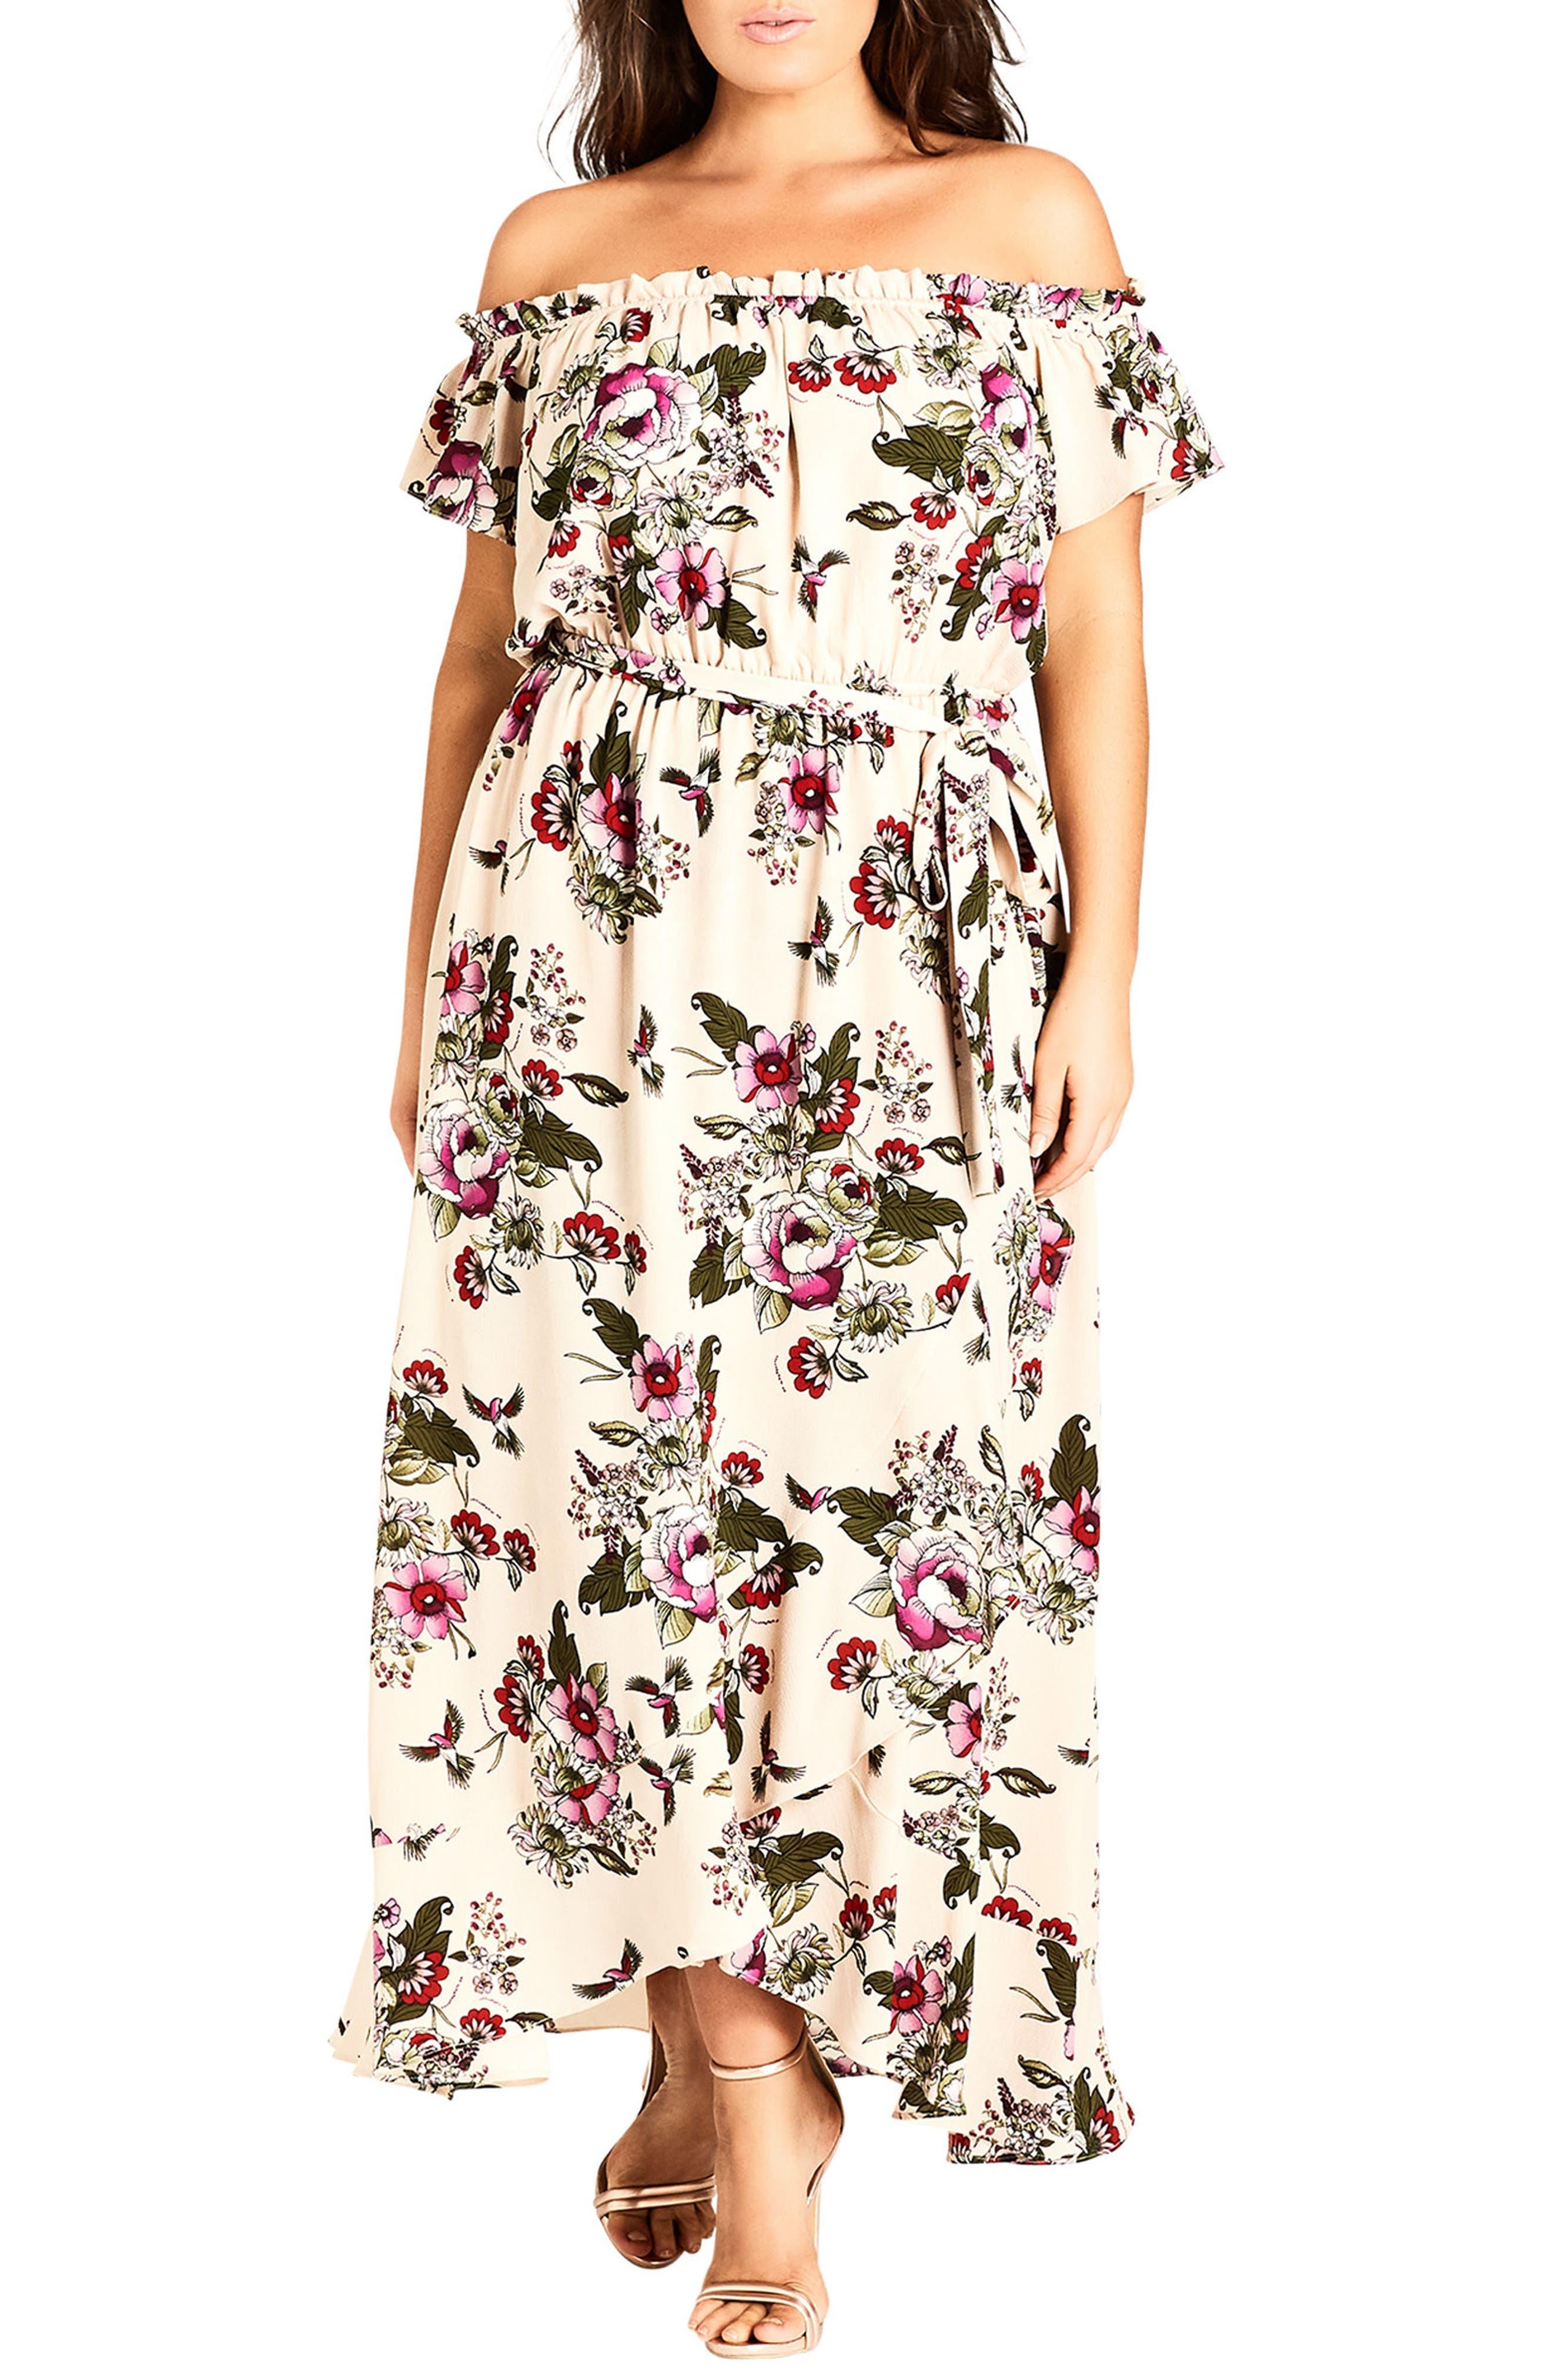 Plus Size City Chic Lolita Floral Off The Shoulder Maxi Dress, White